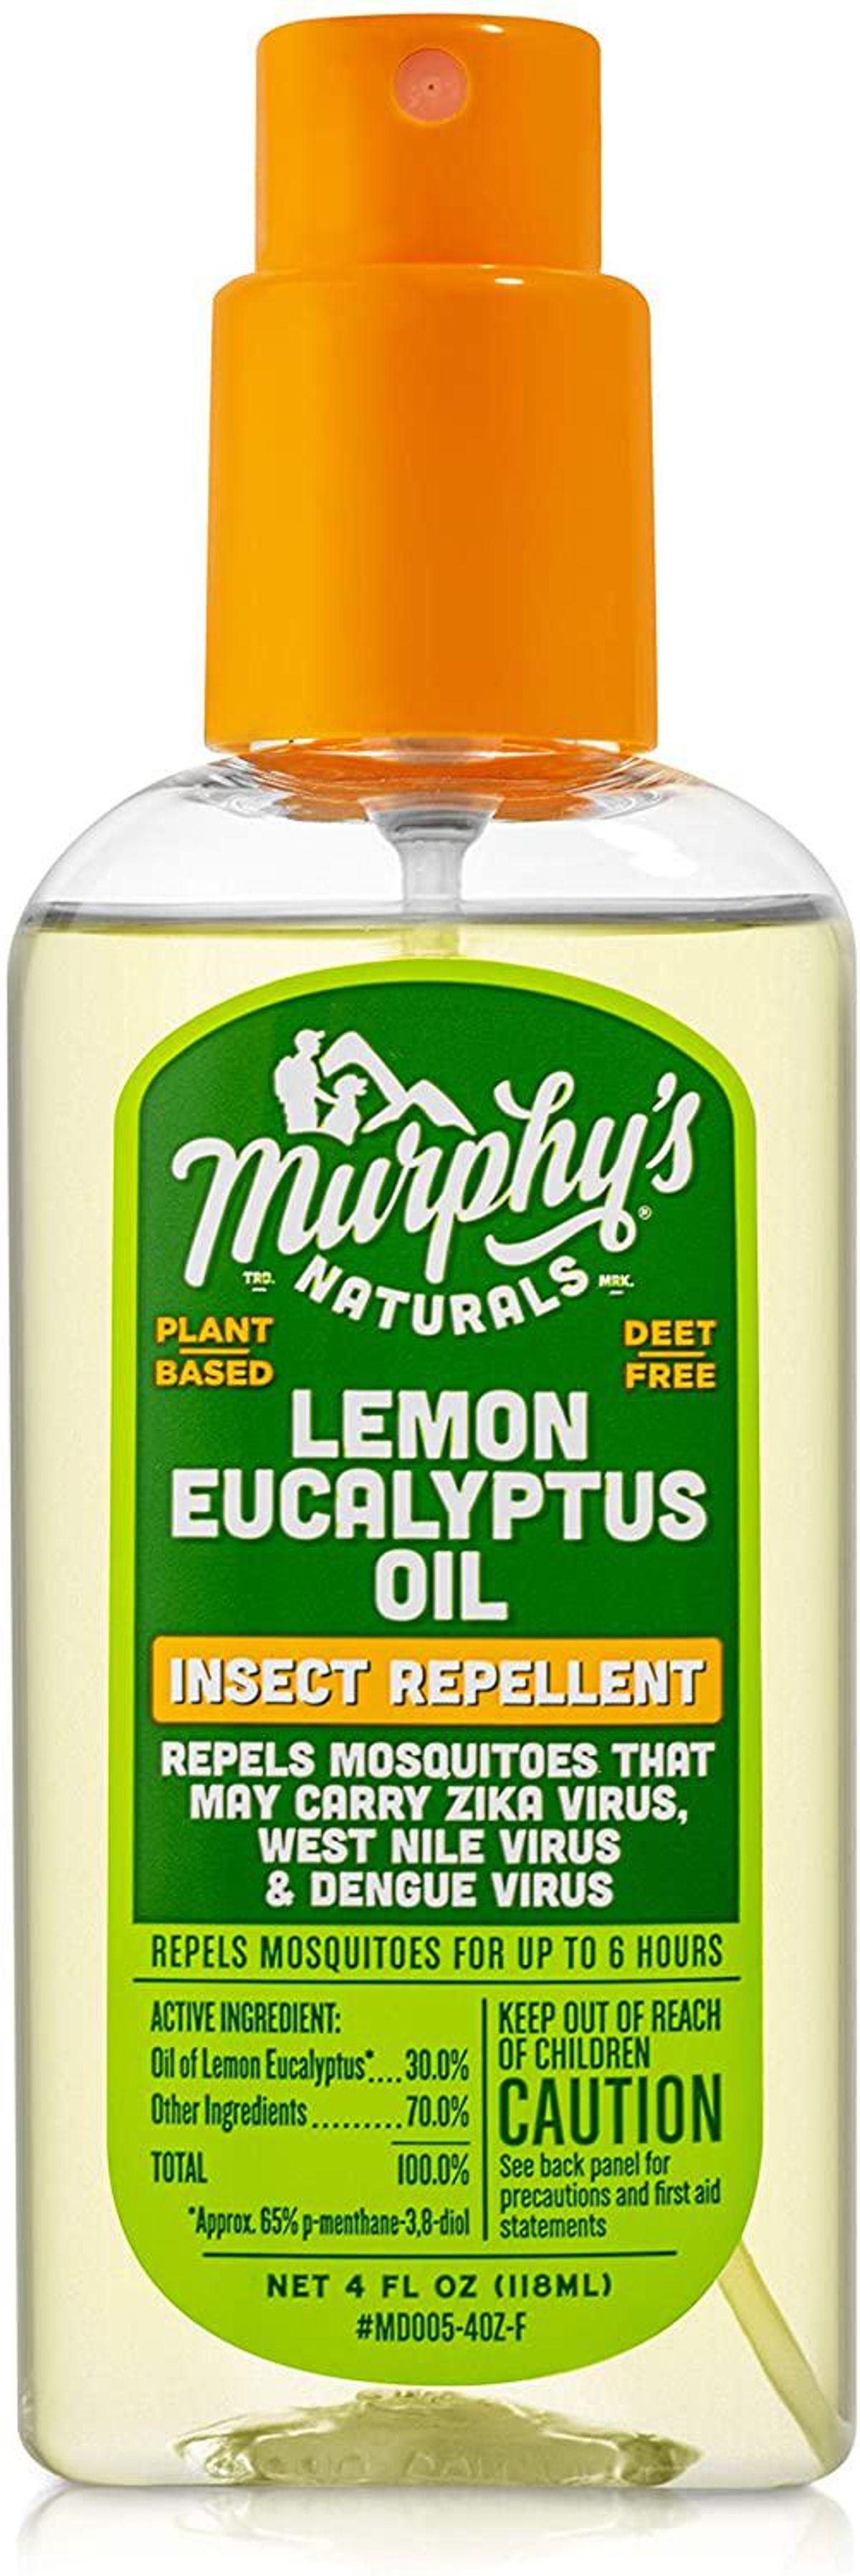 murphys naturals lemon eucalyptus oil insect repellent spray